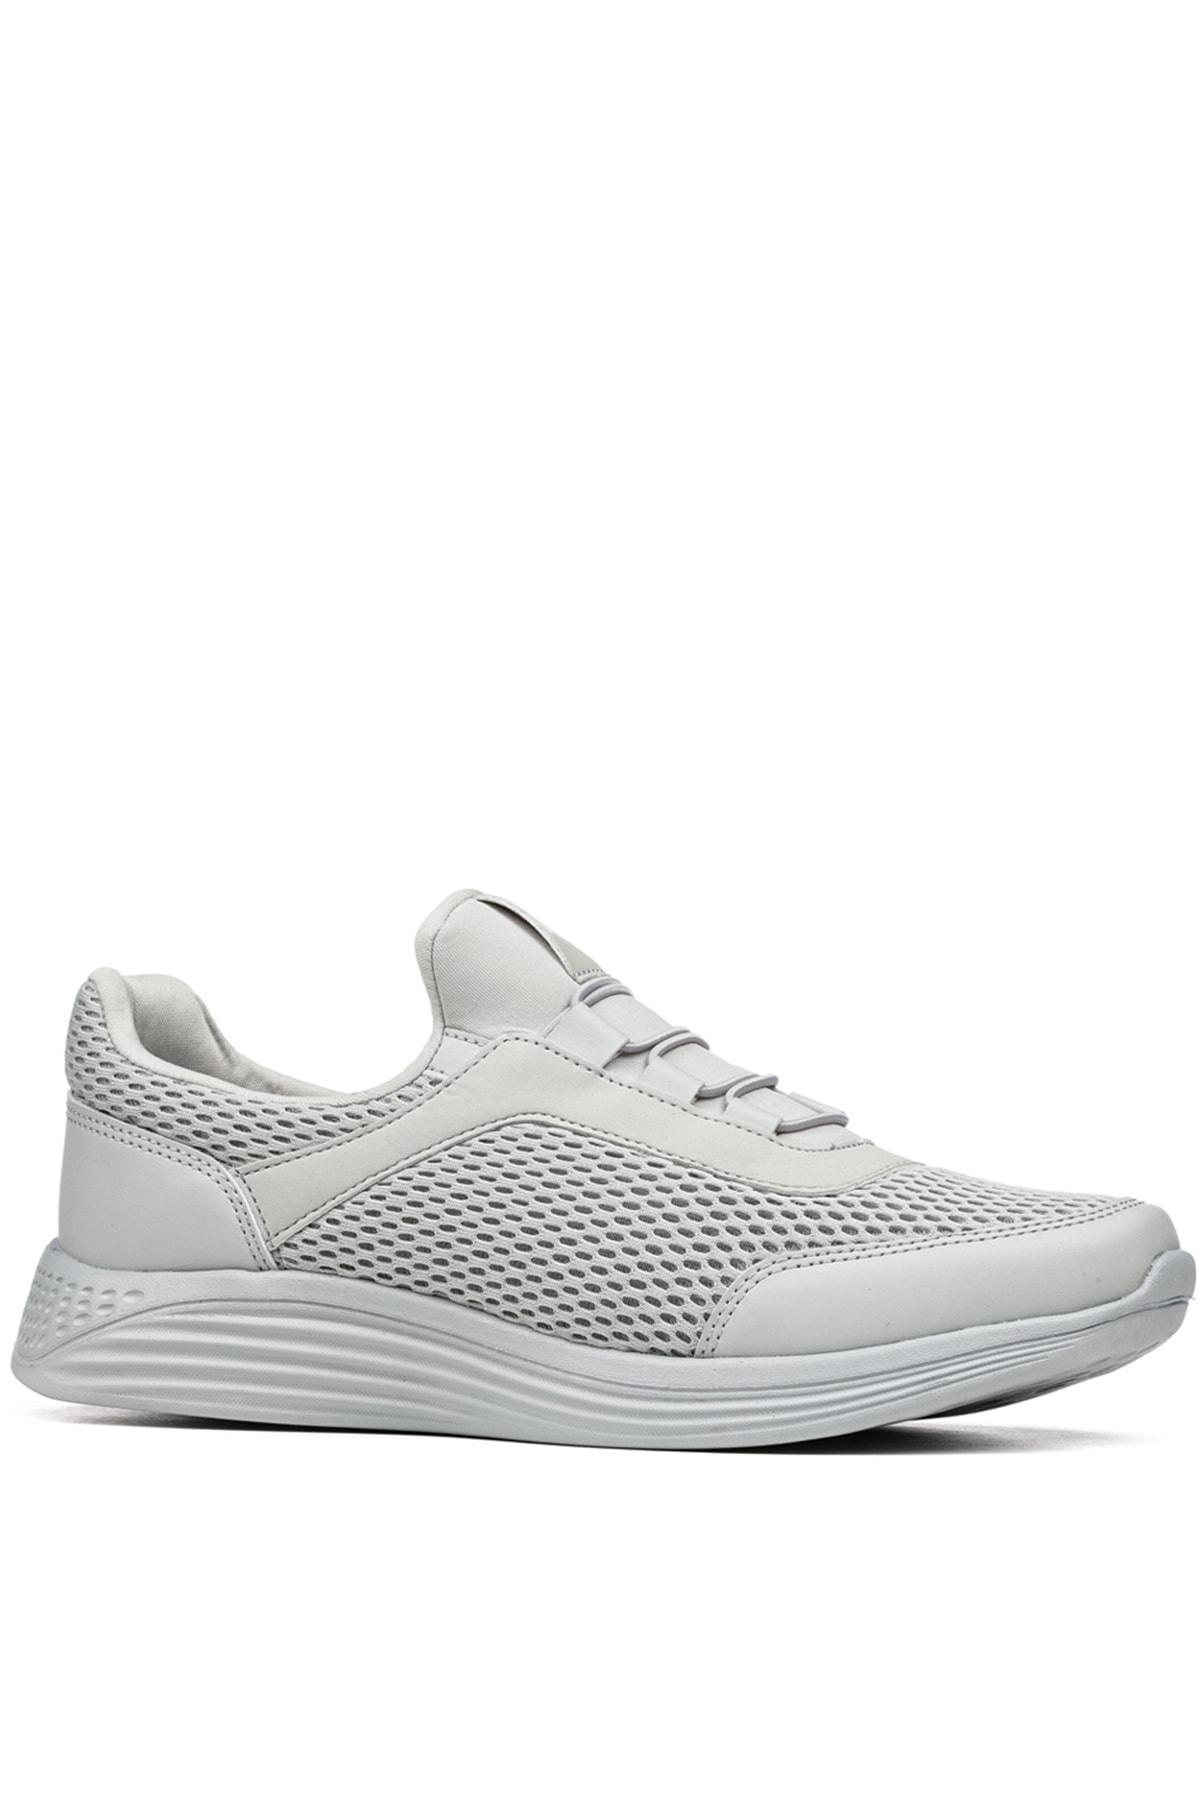 ICELAKE Unisex Sneaker Yb-aqlp0110 1